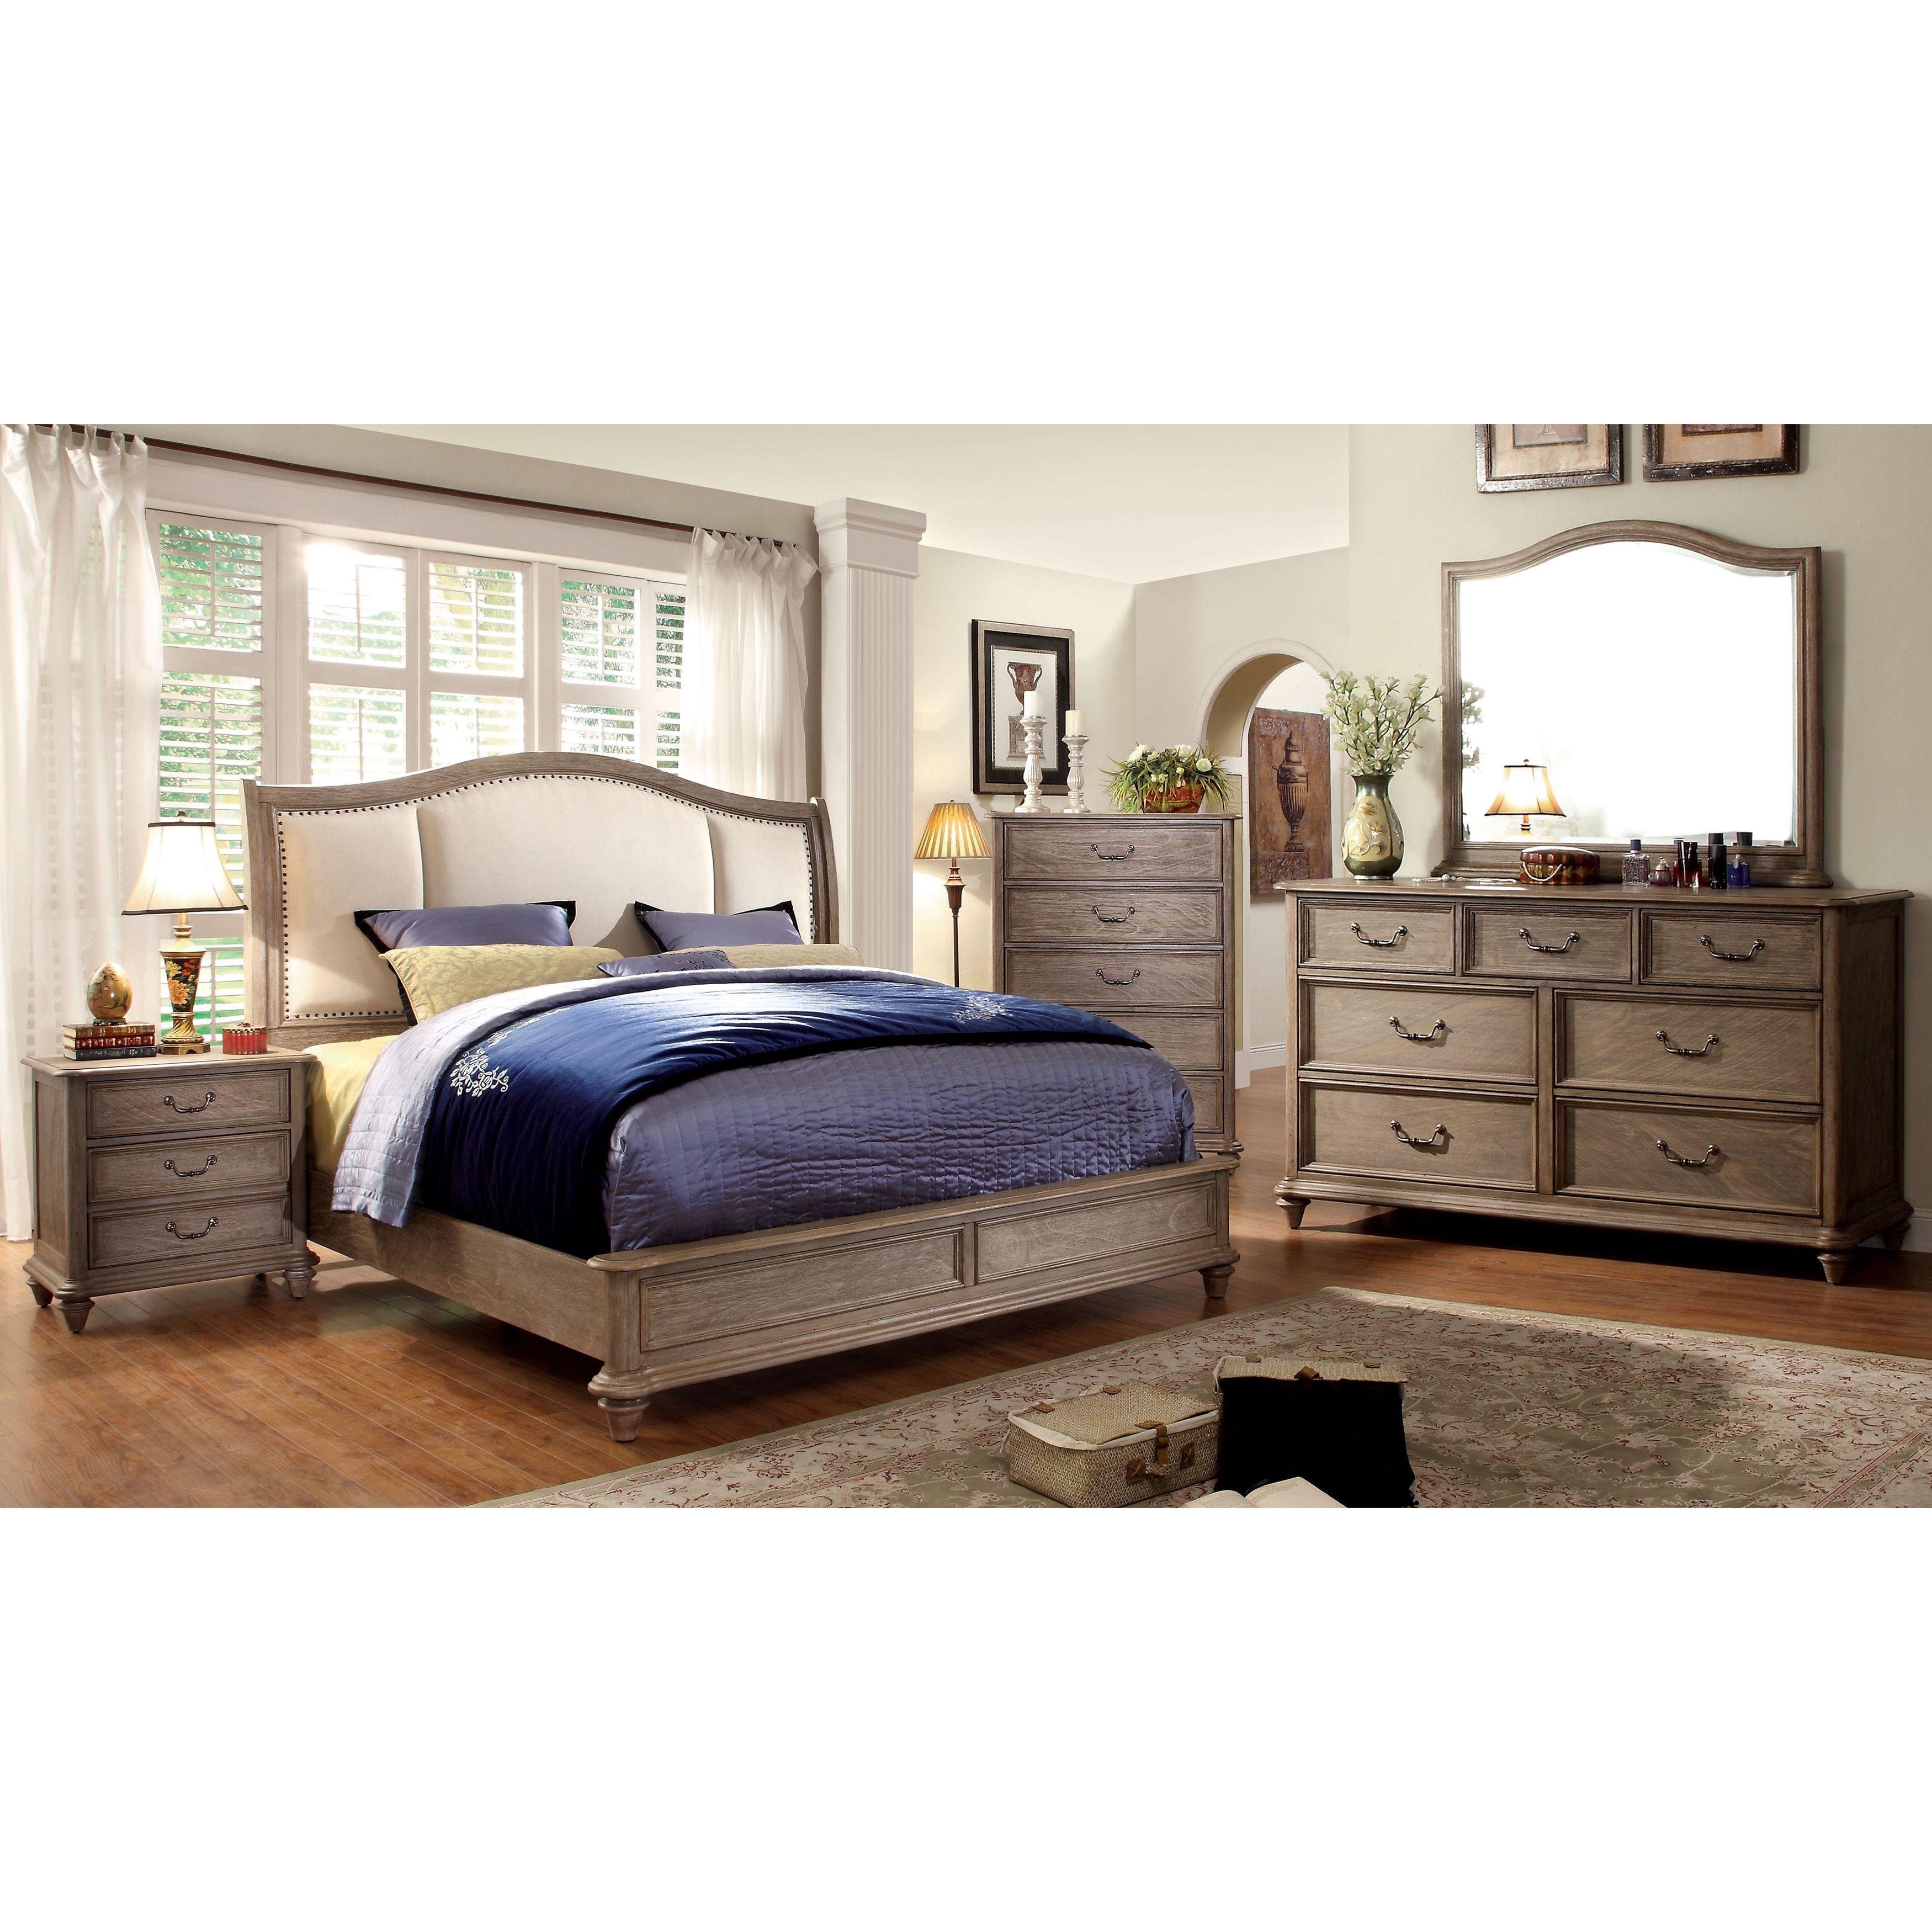 Furniture Of America Siko Rustic Brown 4 Piece Bedroom Set